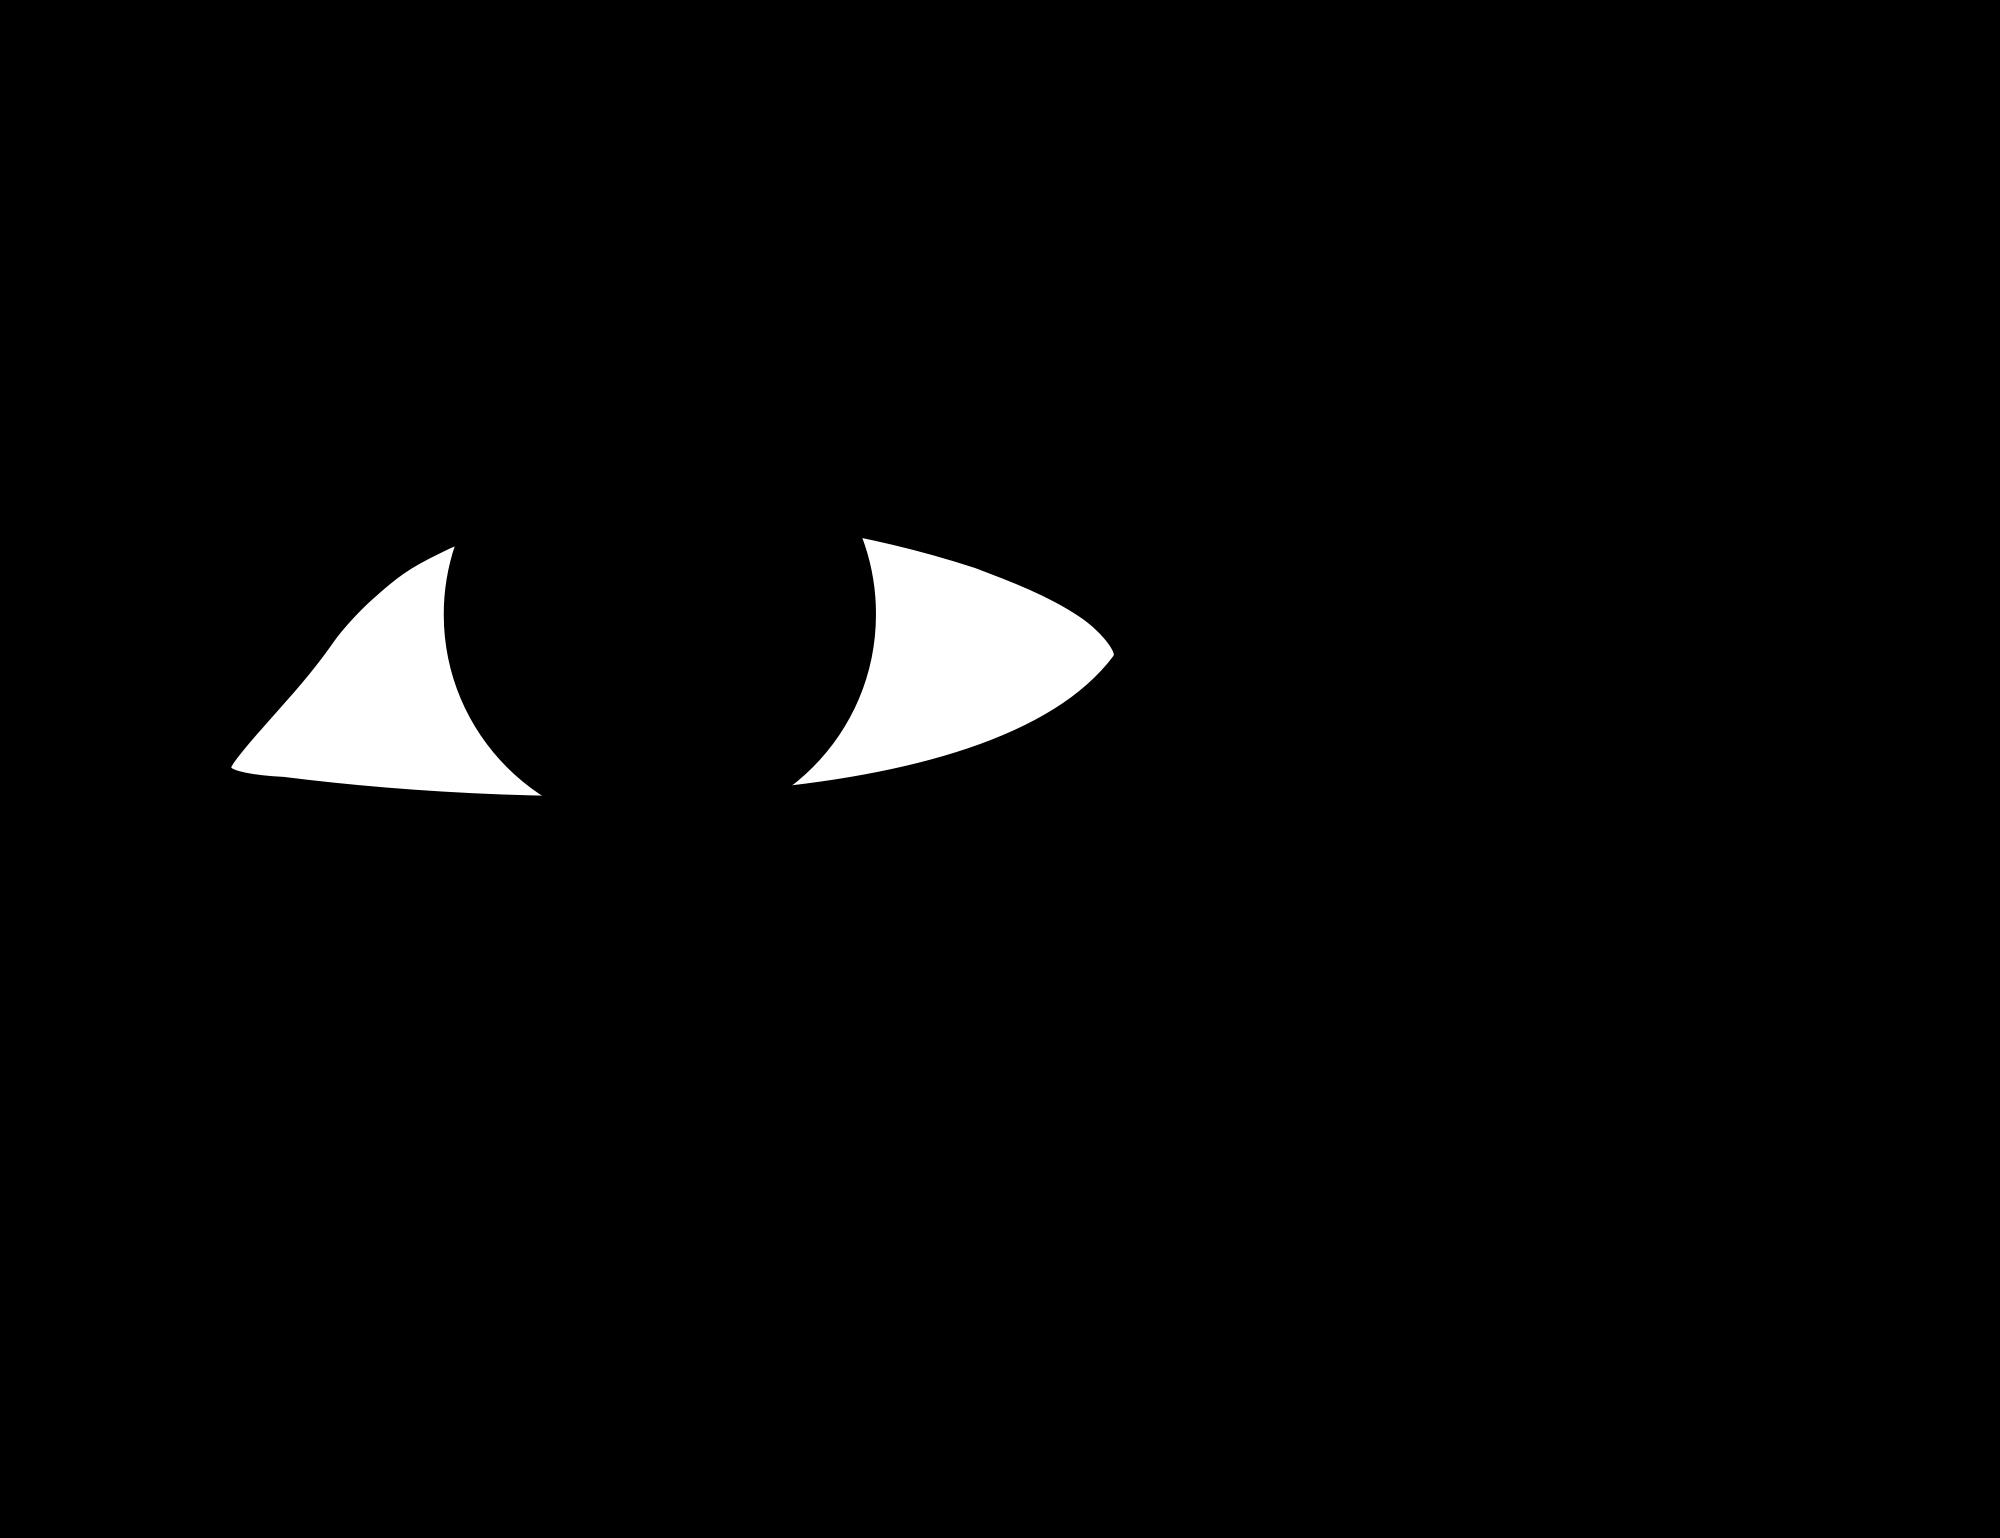 Cool sun blinking eye clipart transparent stock eye of horus   MYTHOLOGHY, MYSTICAL, MAGICAL   Pinterest   Symbols ... transparent stock